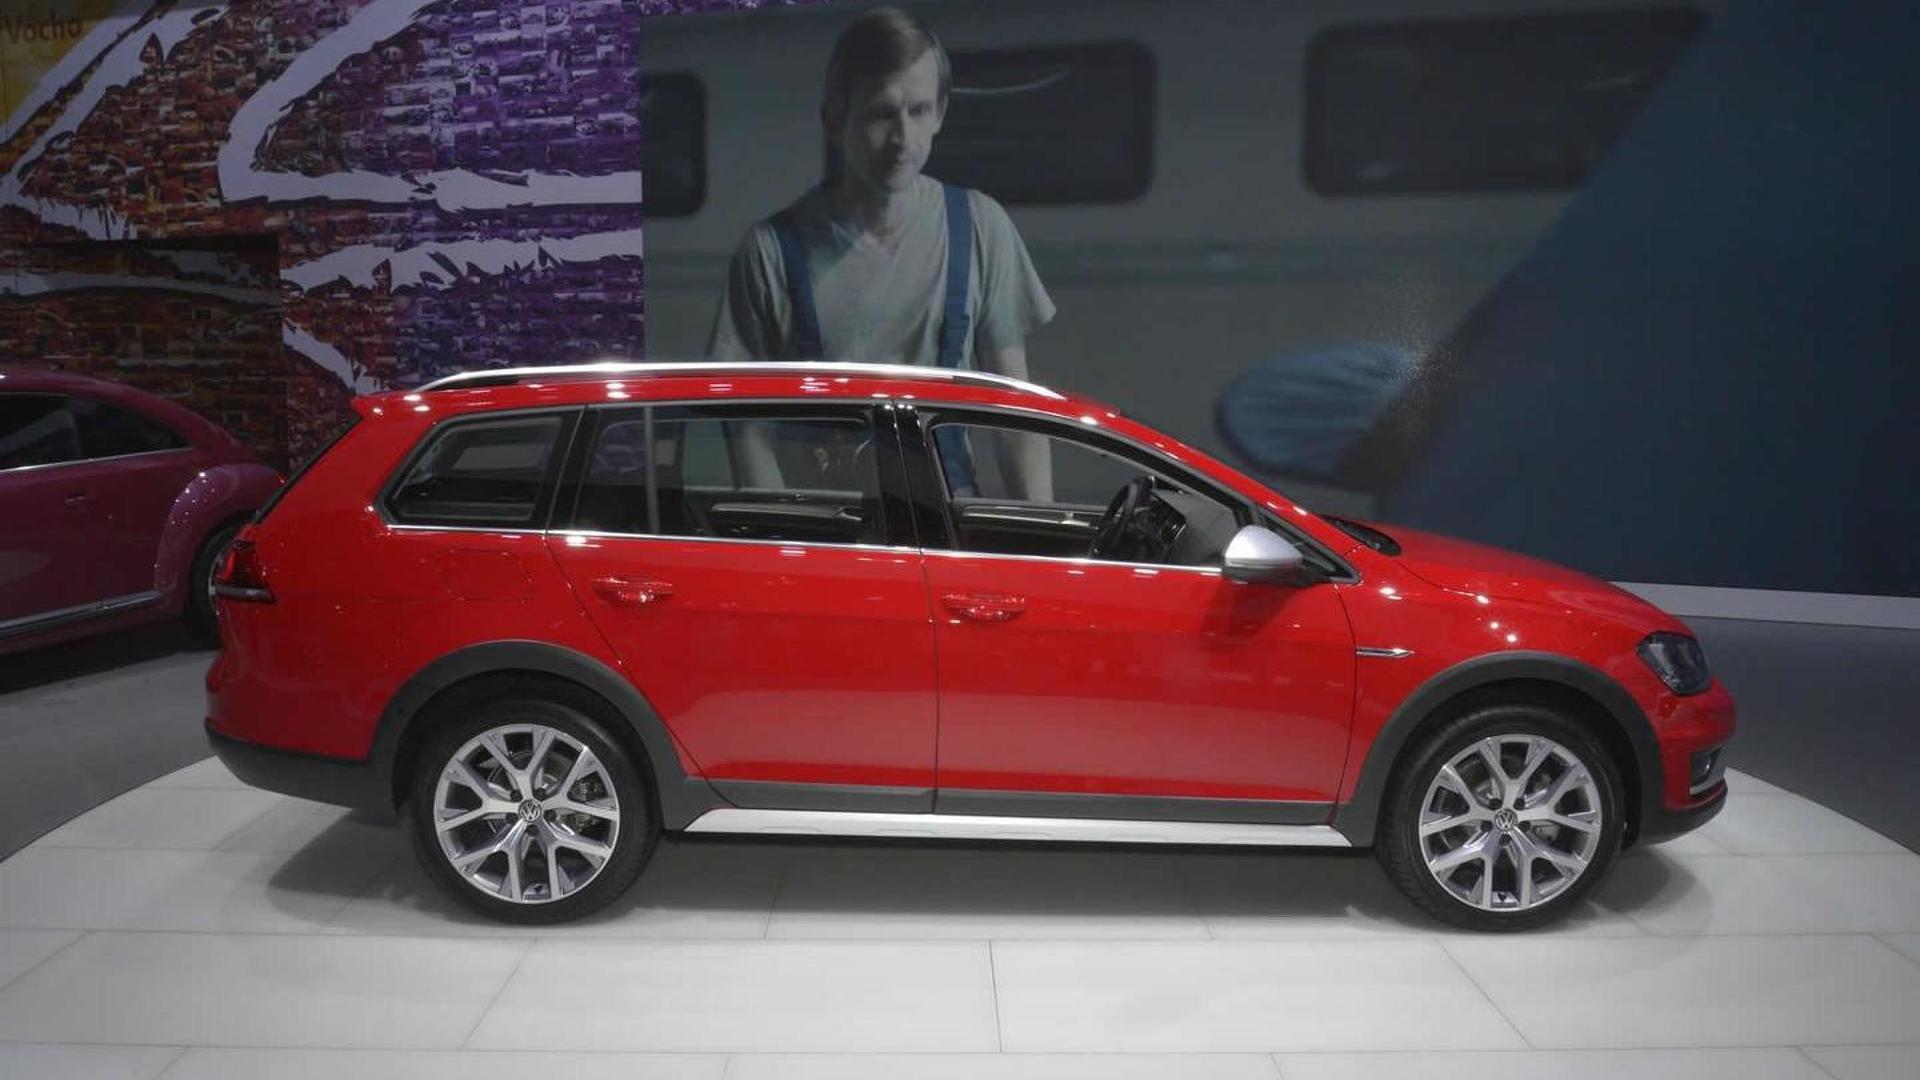 Volkswagen Golf Sportwagen Alltrack Brings Rugged Body To Ny Goes On In 2016